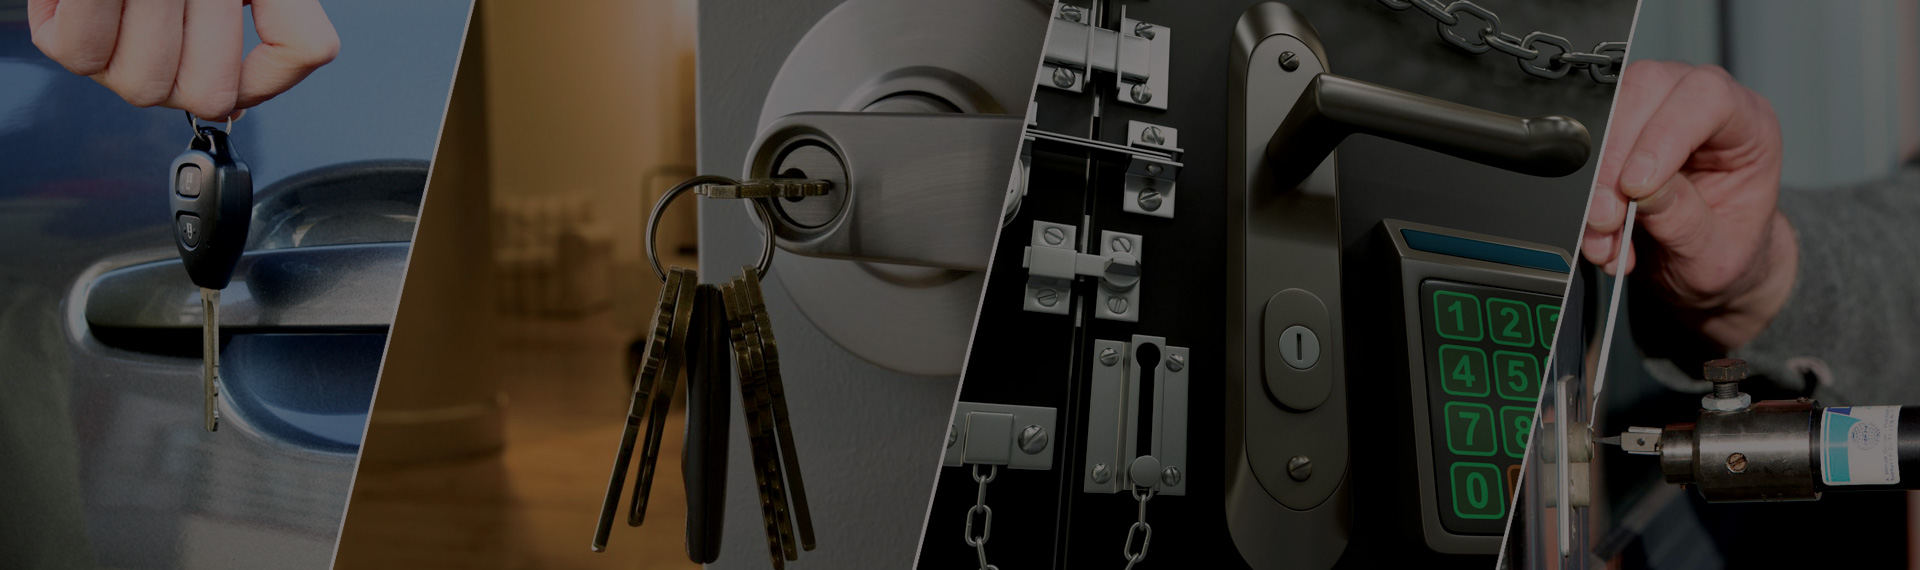 A 24 Hours Emergency Locksmith Greenburgh NY